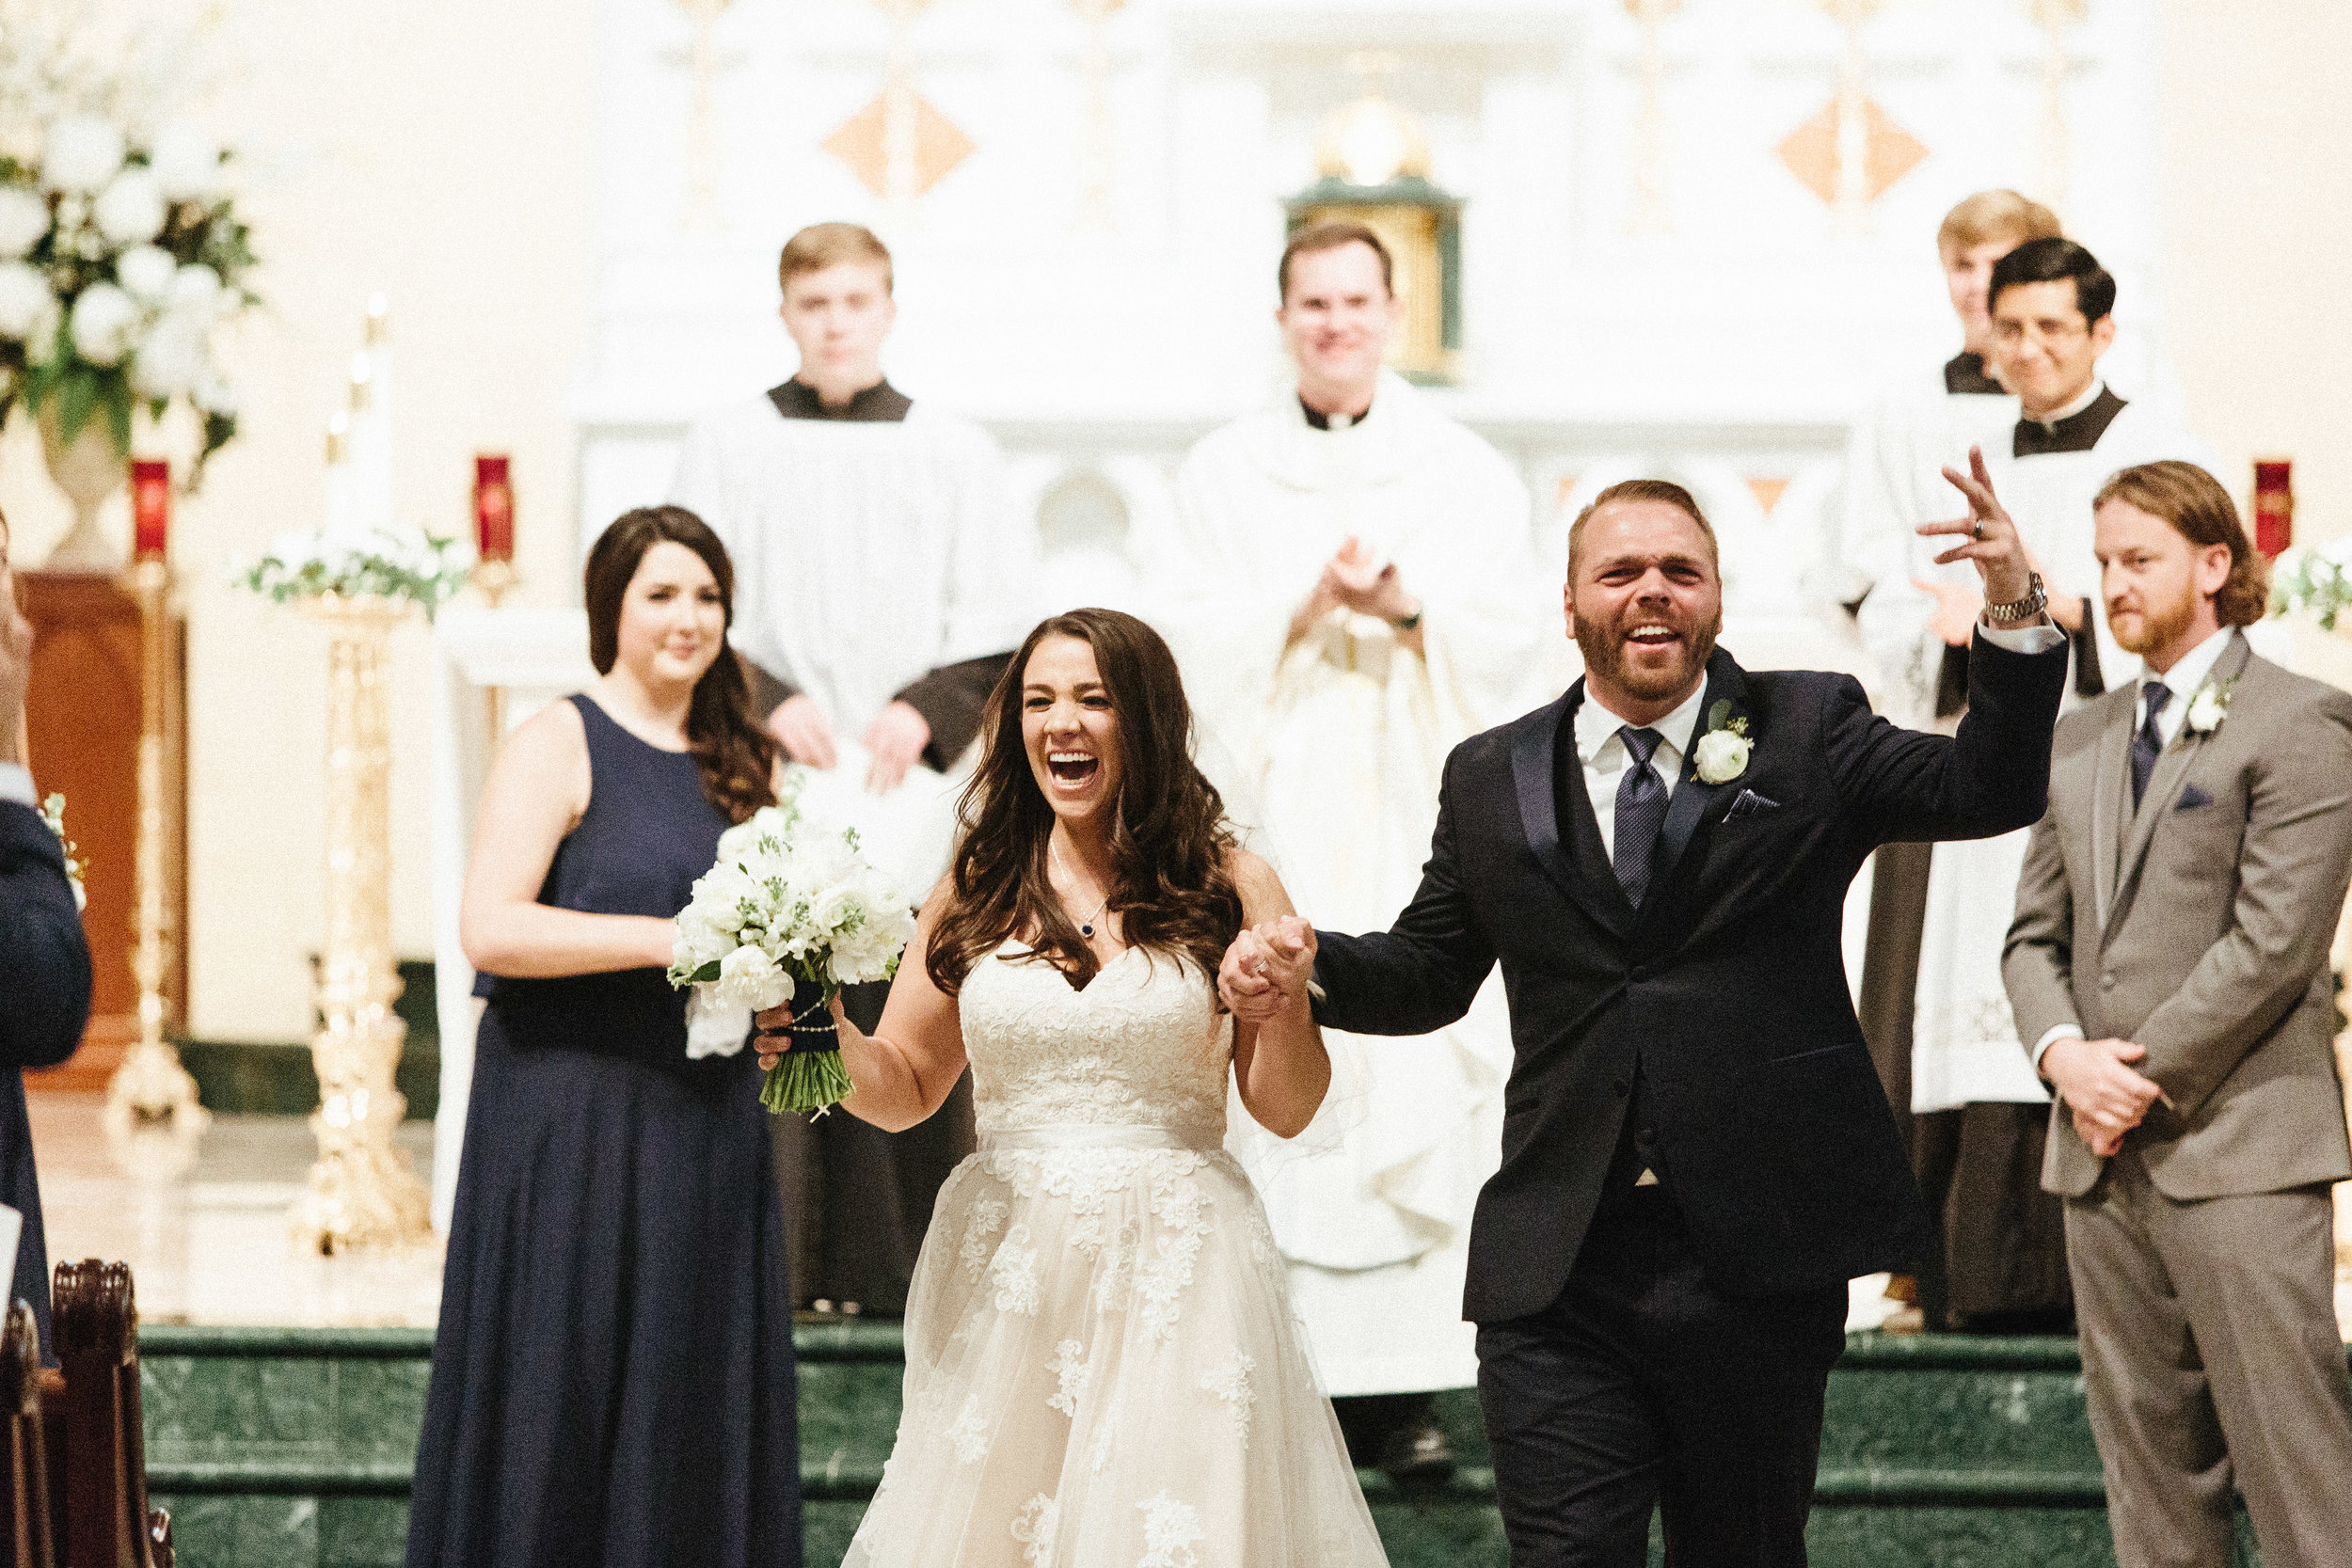 roswell_st_peter_chanel_catholic_avalon_hotel_alpharetta_wedding-1547.jpg